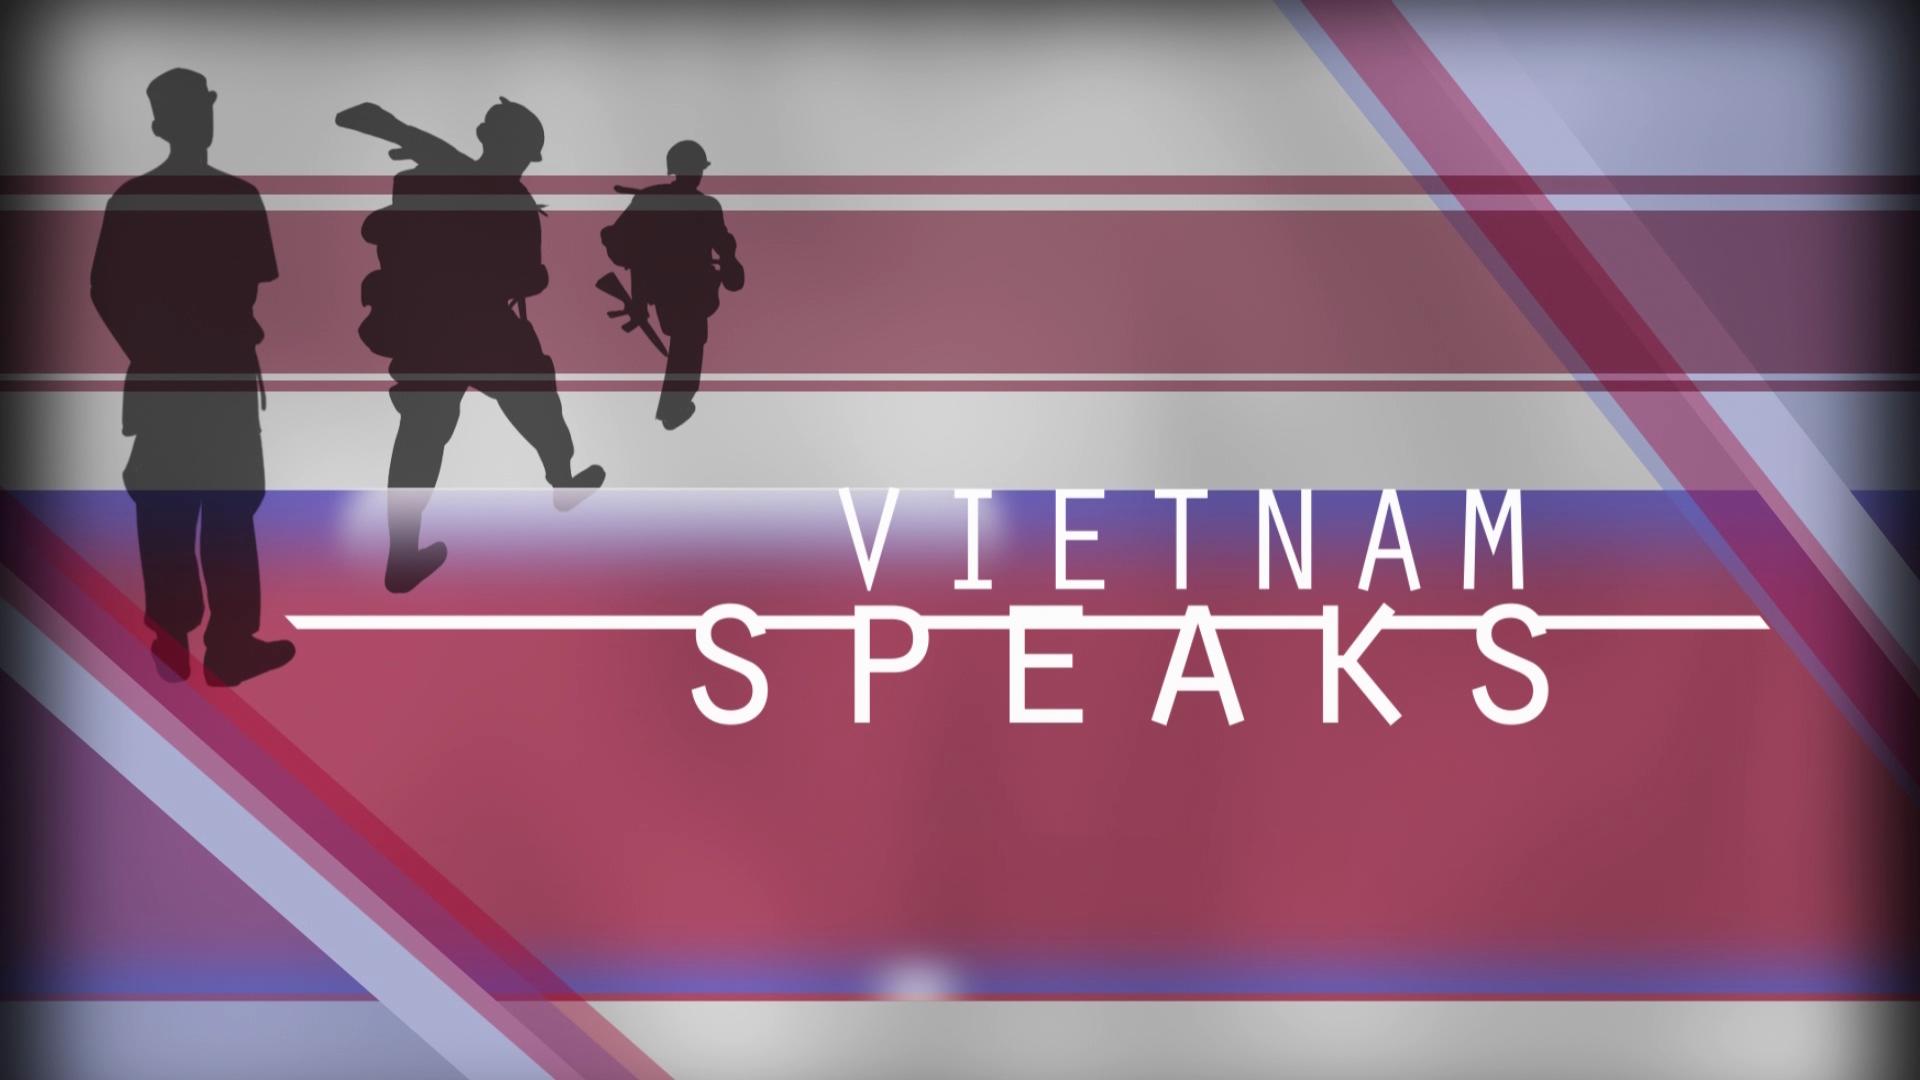 Vietnam Speaks